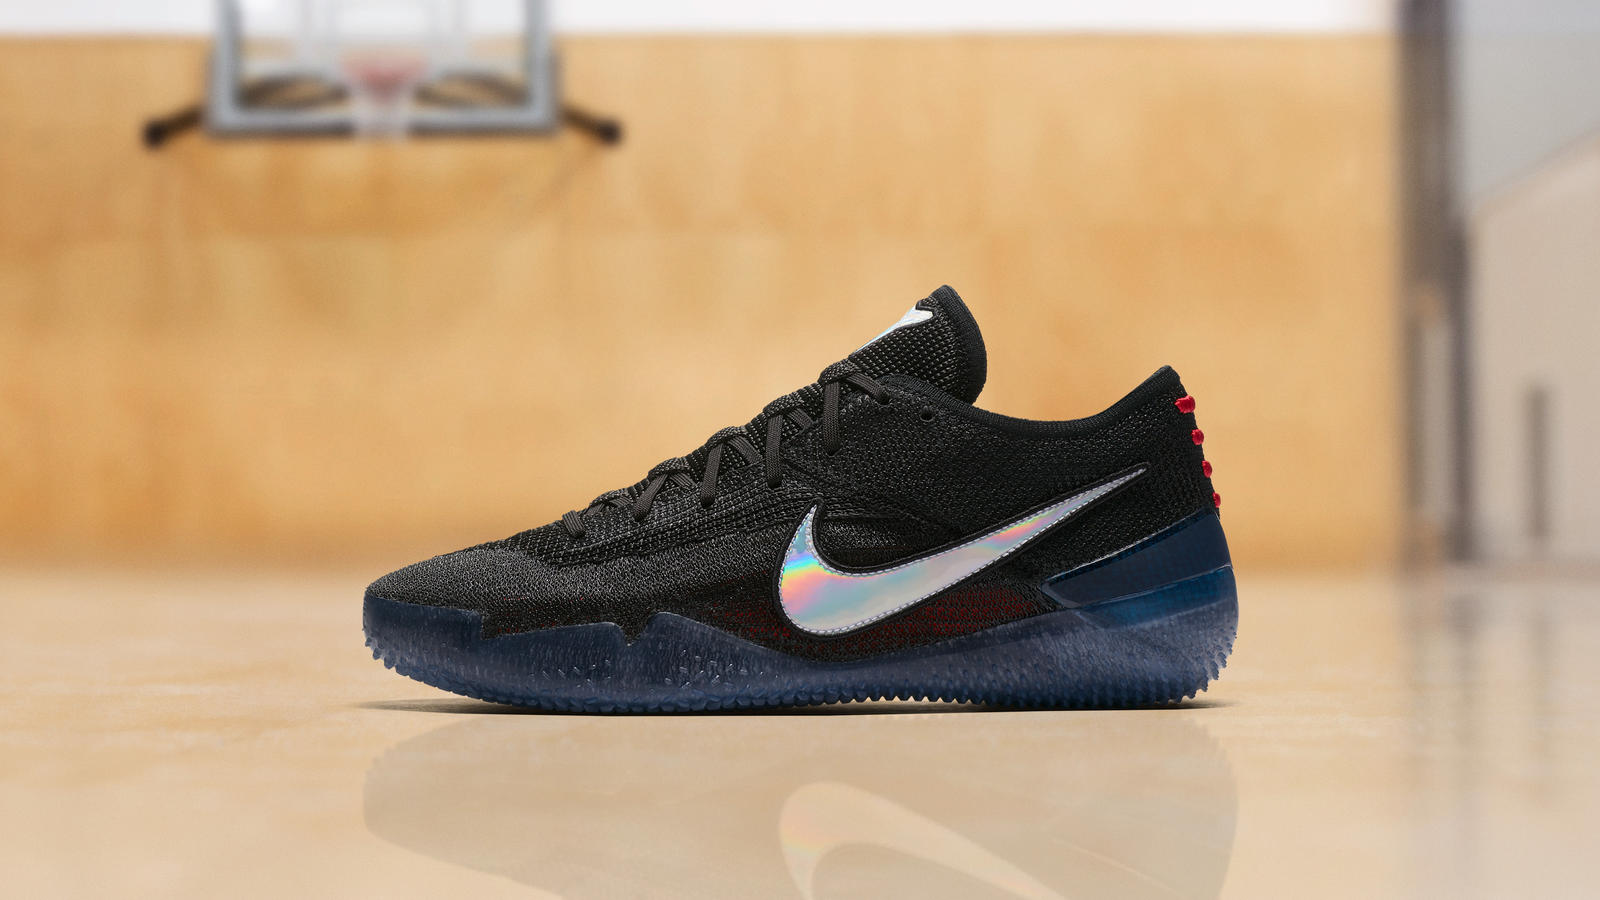 official photos 4d487 c5310 Nike Kobe AD NXT 360 0 · Basketball   Kicks On Court   Nike ...